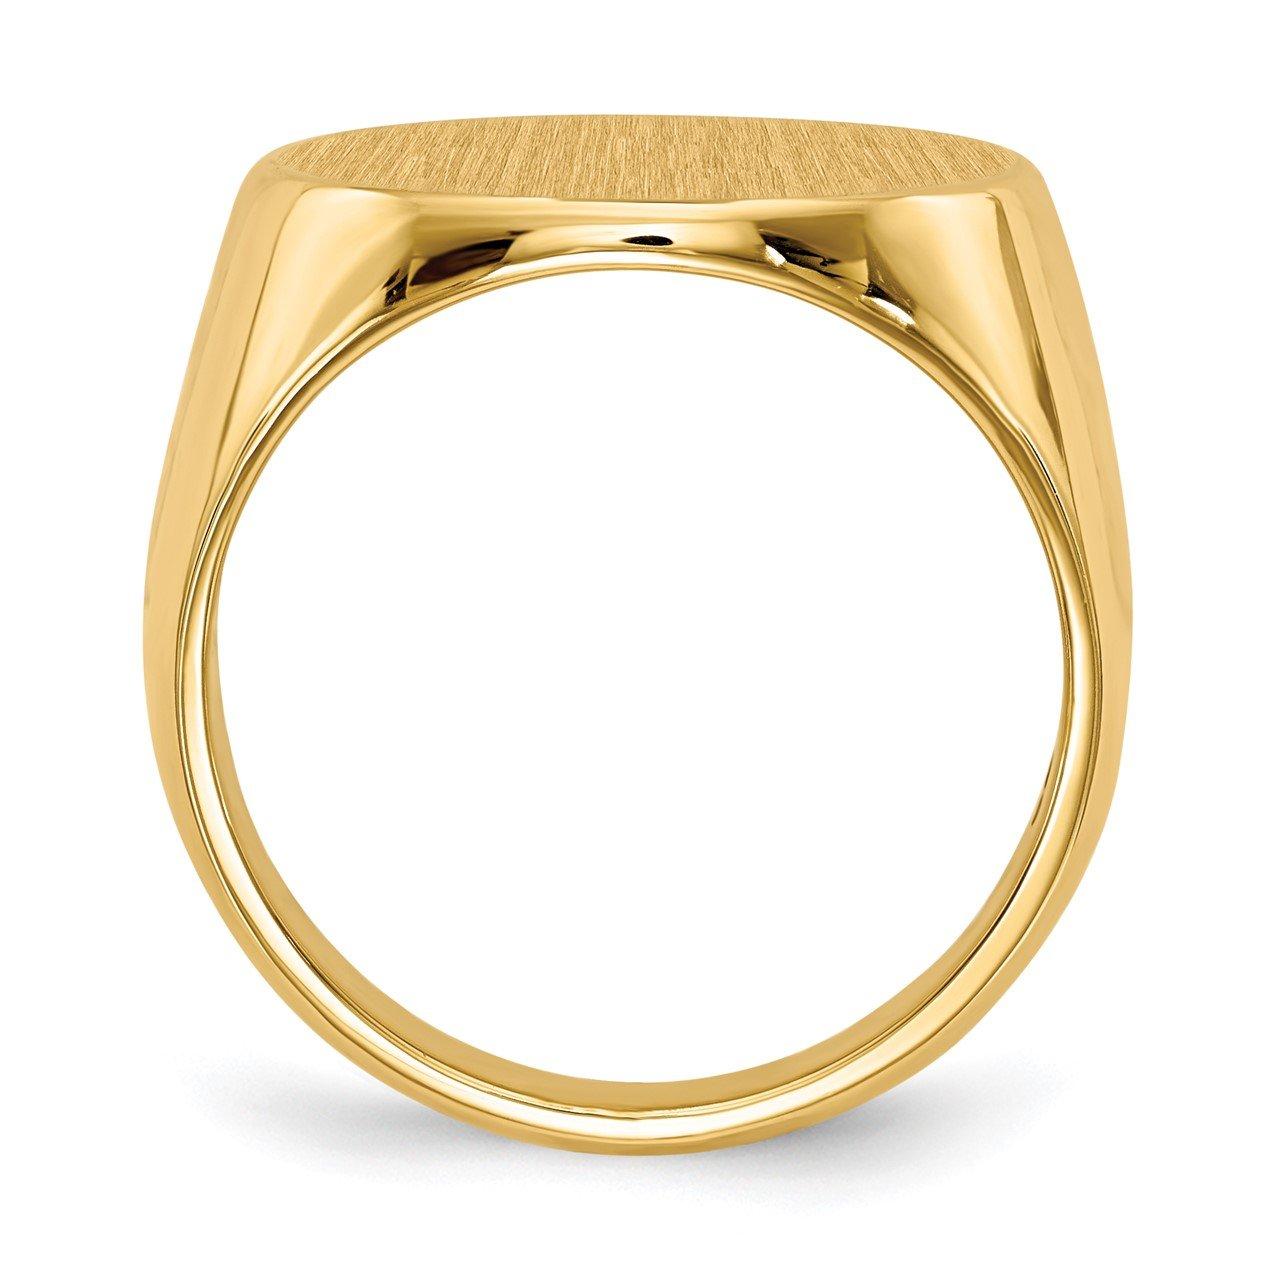 14k 17.5x18.0mm Closed Back Men's Signet Ring-1